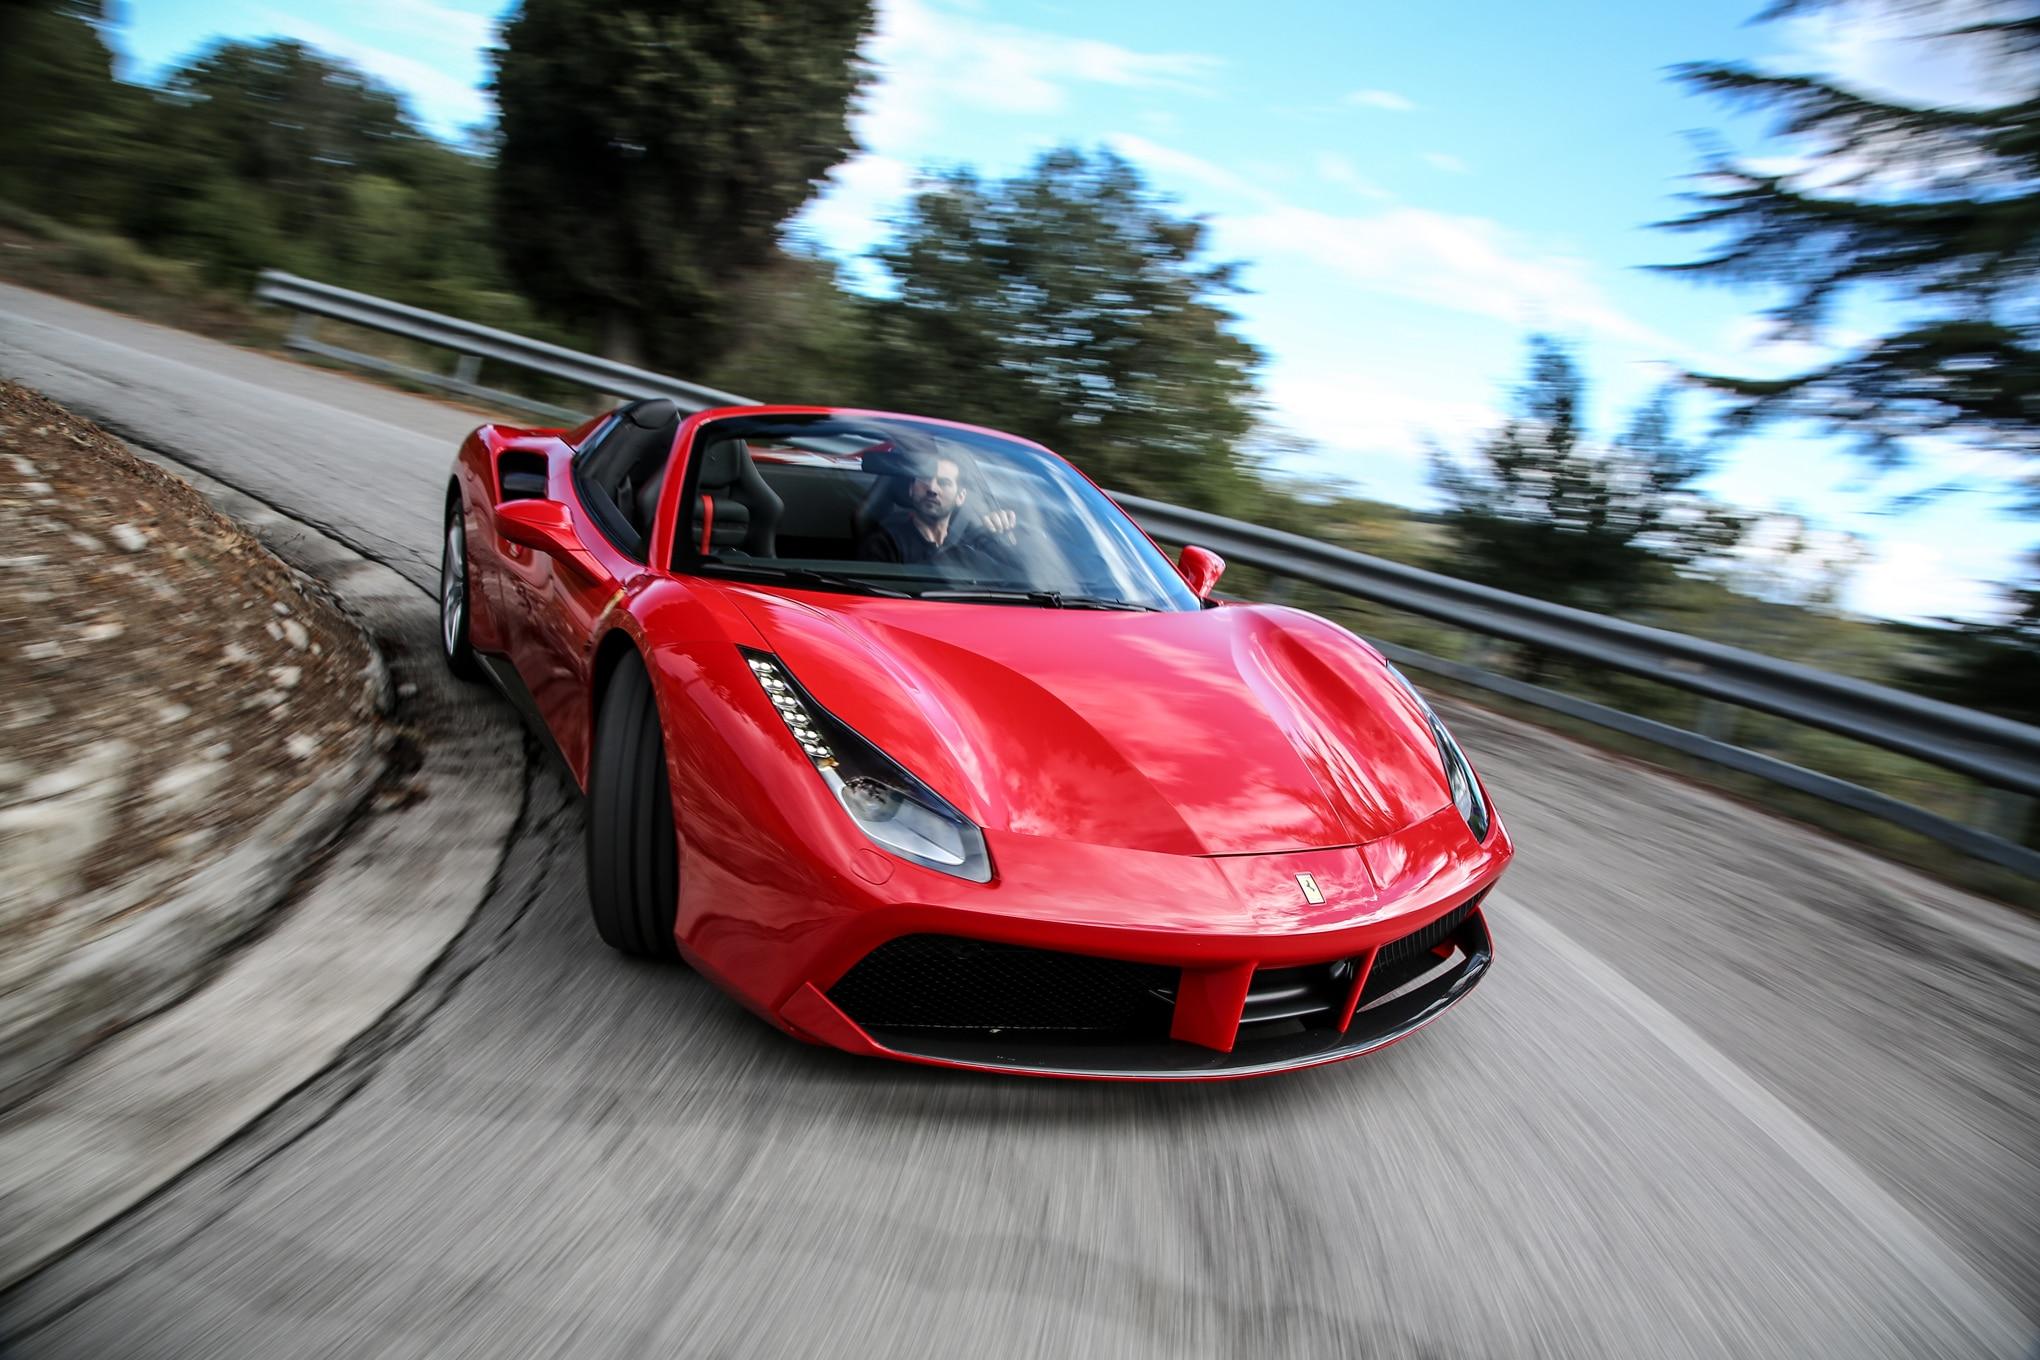 Ferrari Completes Separation From Fiat Chrysler